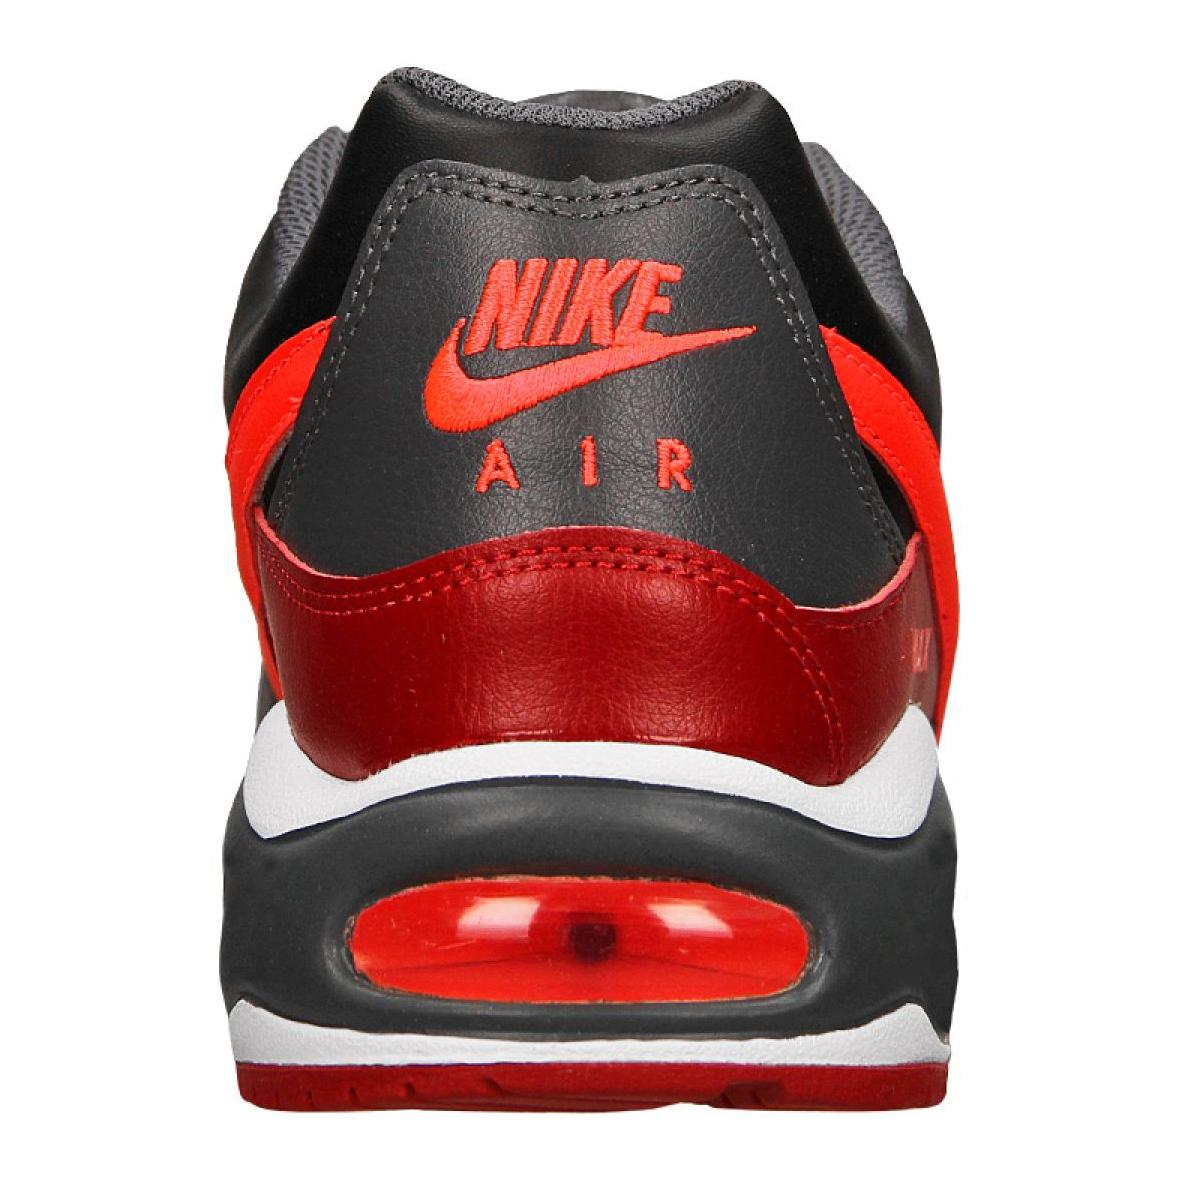 Buty Nike Air Max Command M 629993 051 wielokolorowe